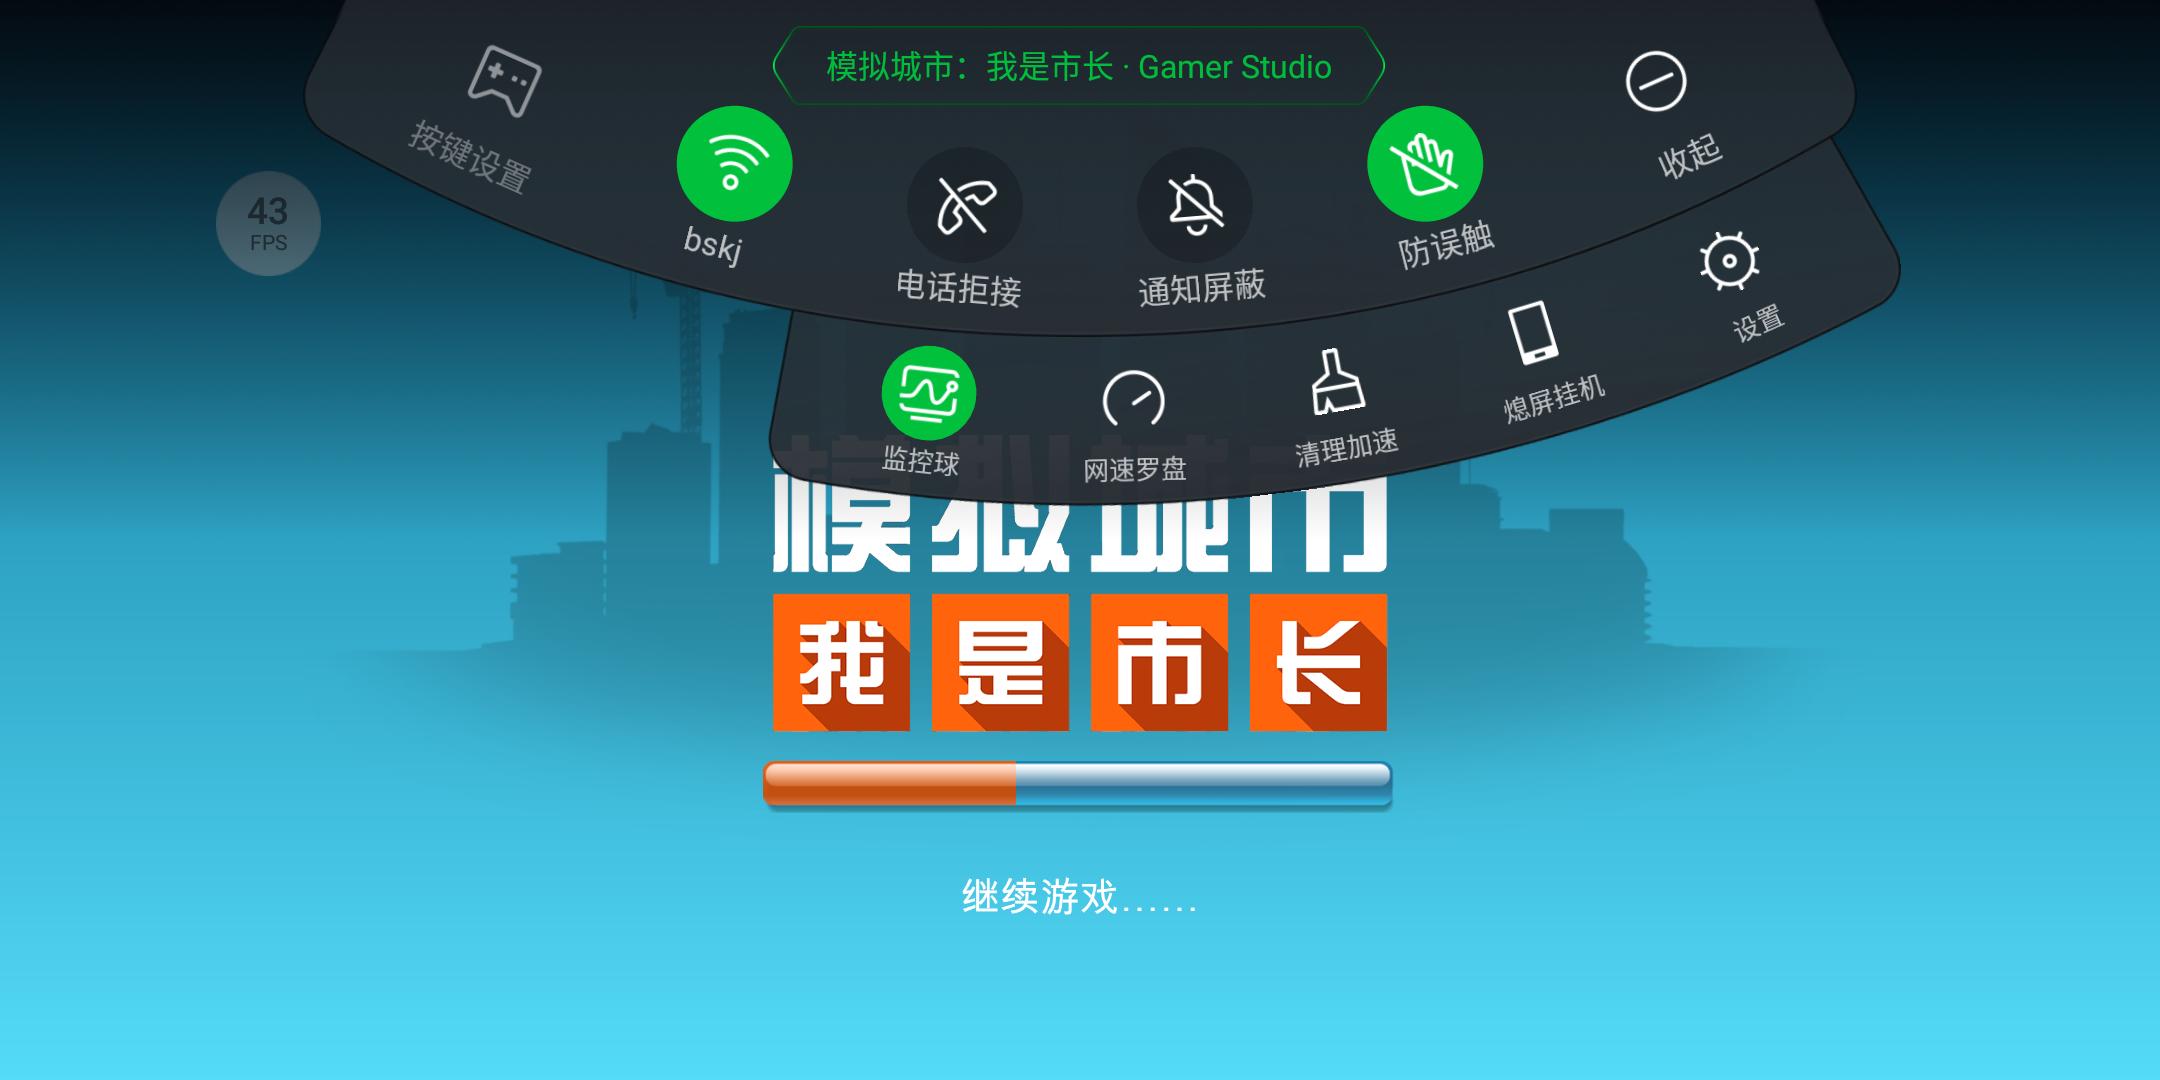 Screenshot_2018-12-10-16-25-20-724_com.ea.simcitymobile.gc.png